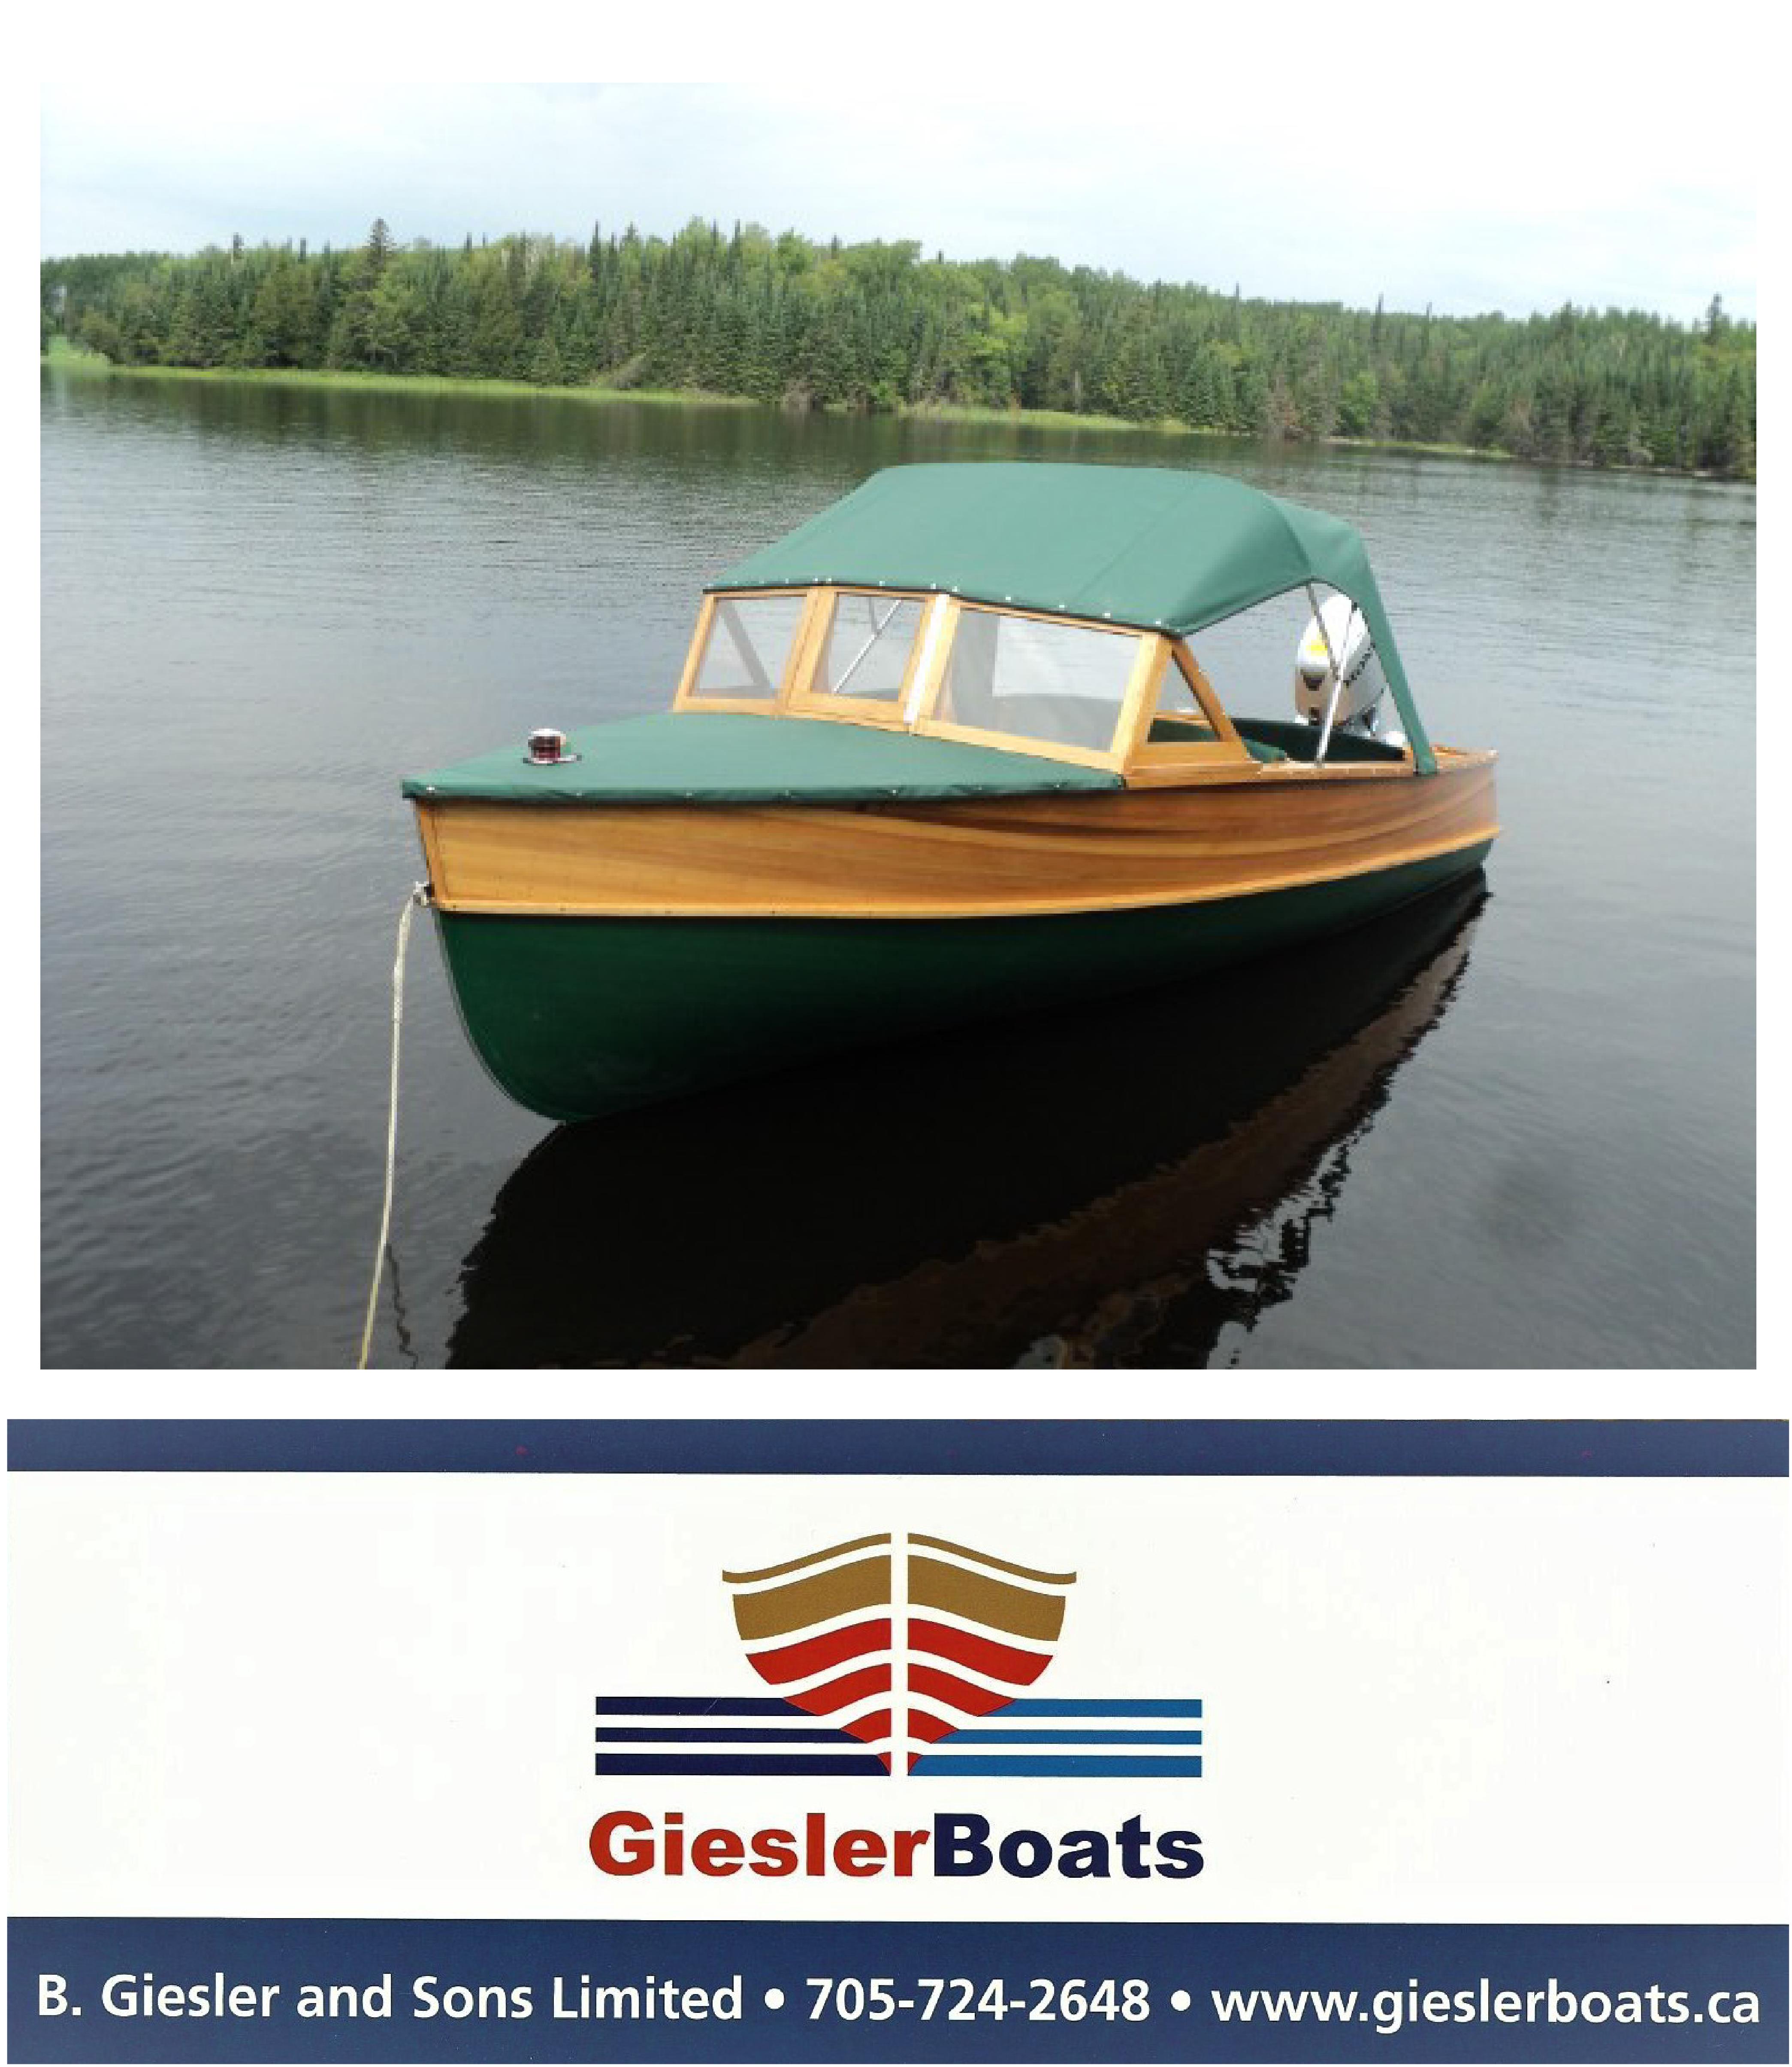 Geisler Boats